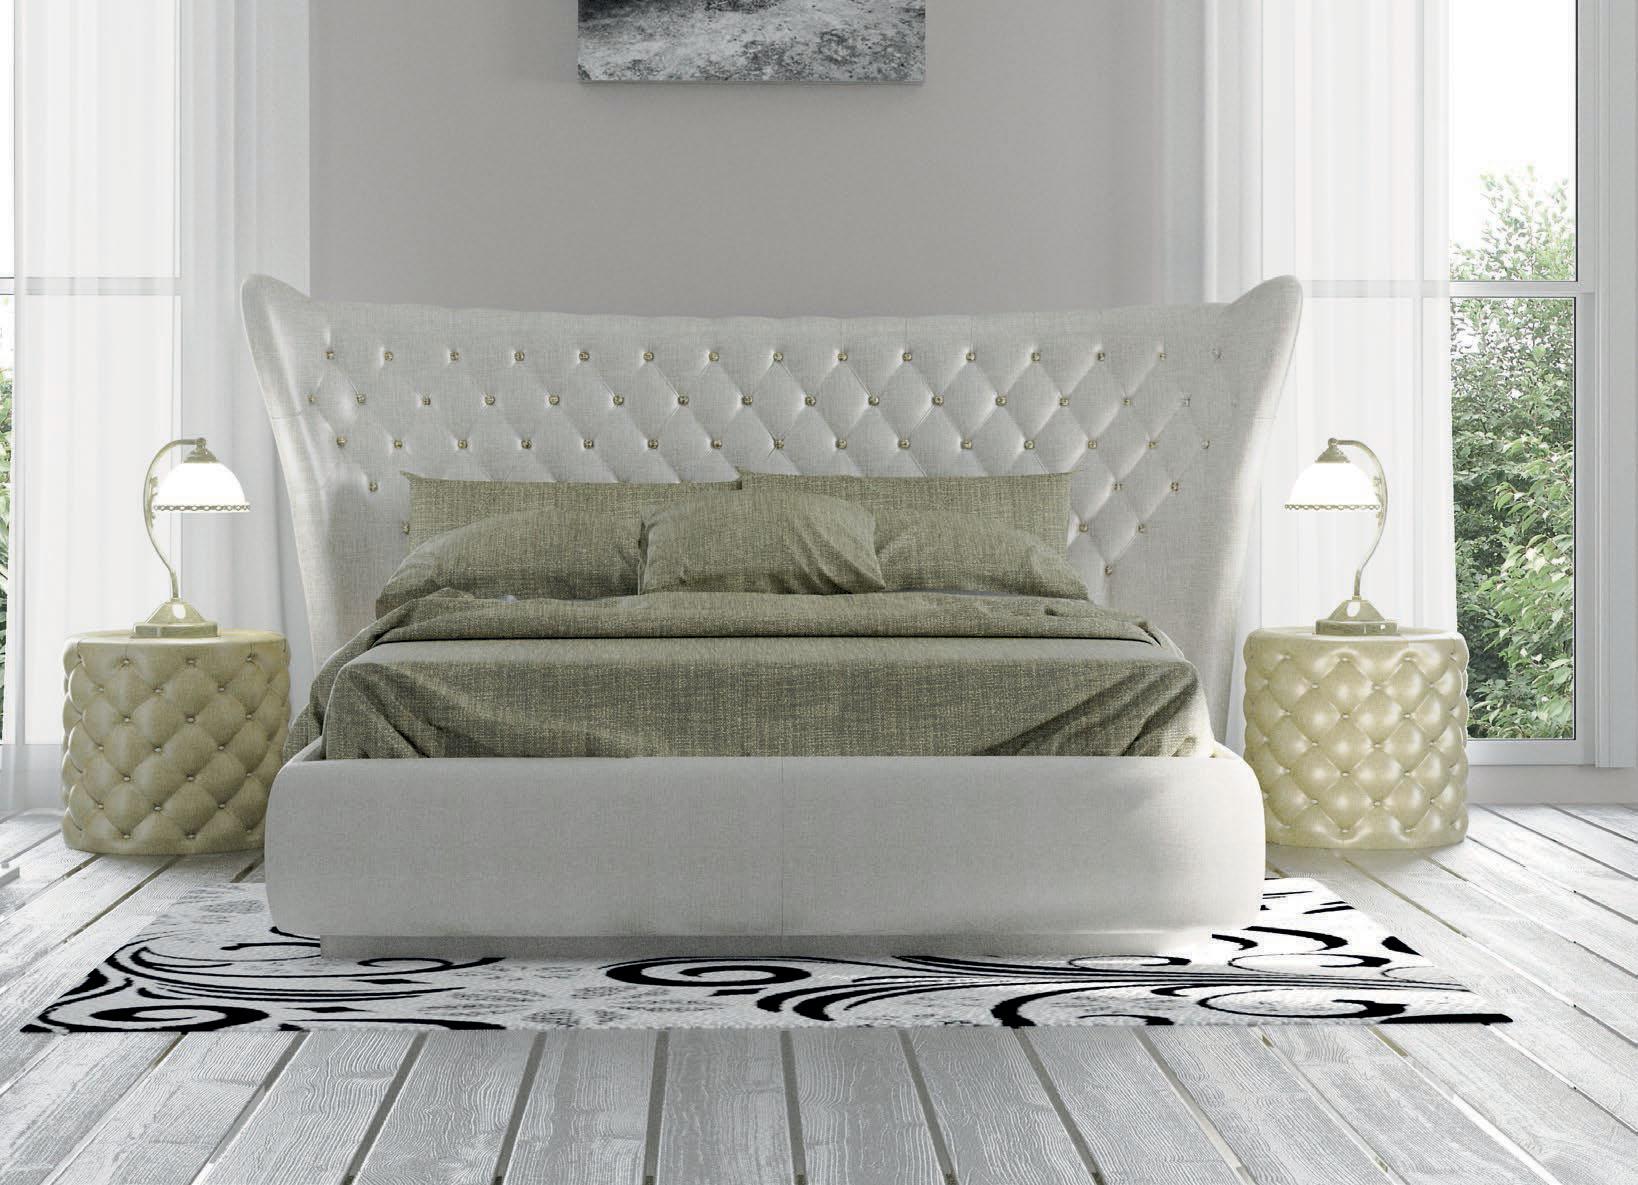 Dor 158 Franco Furniture Bedrooms Vol3 Spain Brands